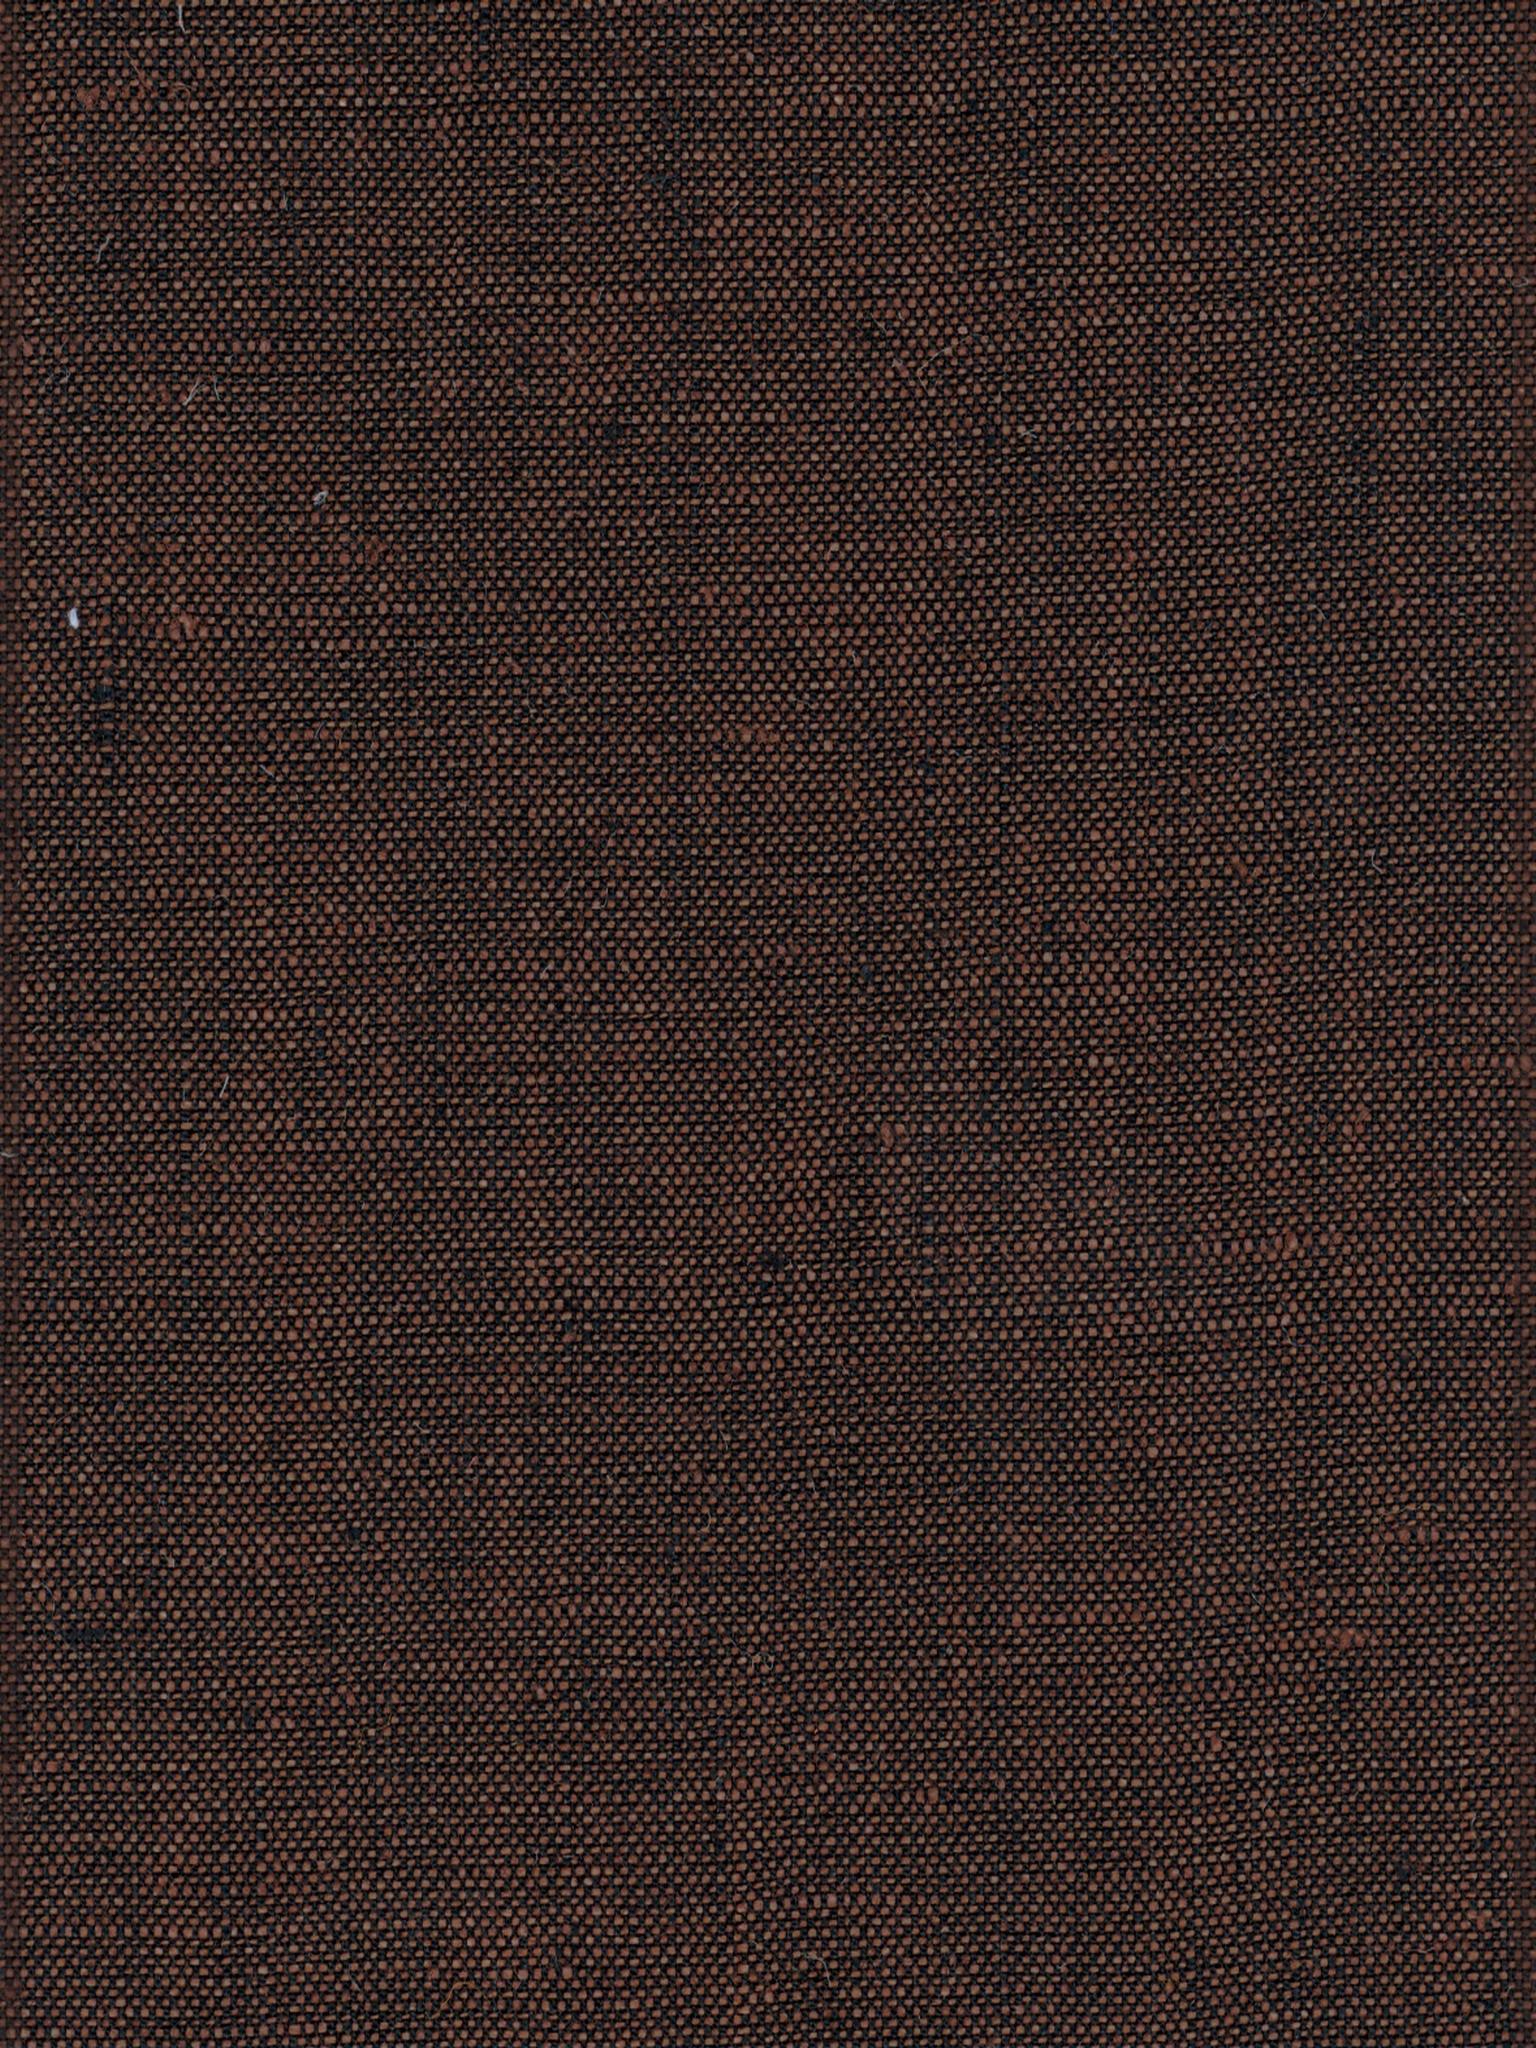 CERRO Brown/Black